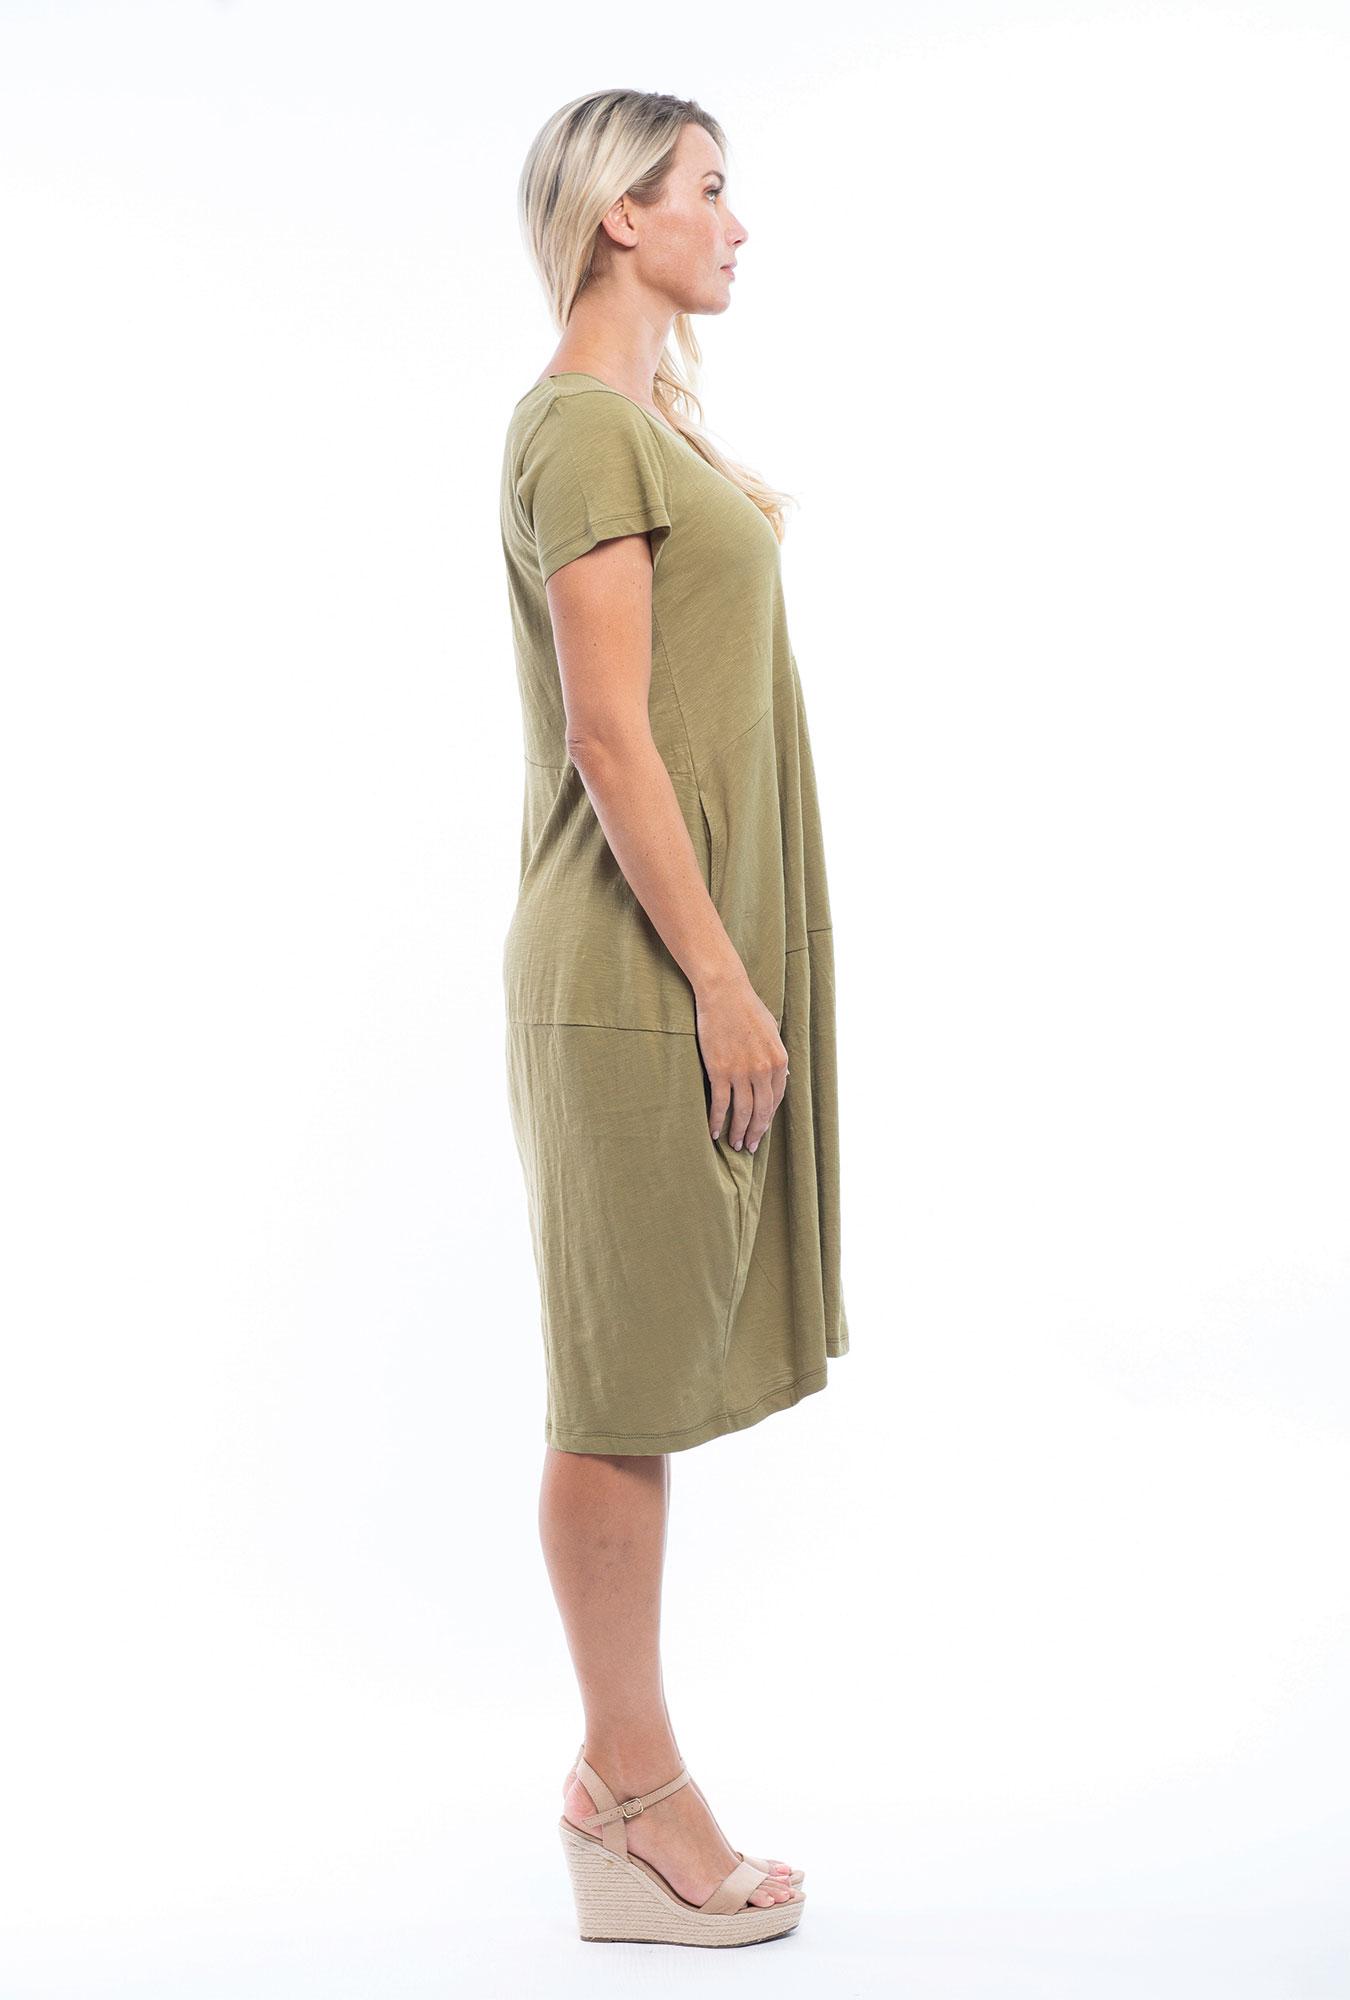 Josie Dress in Olive